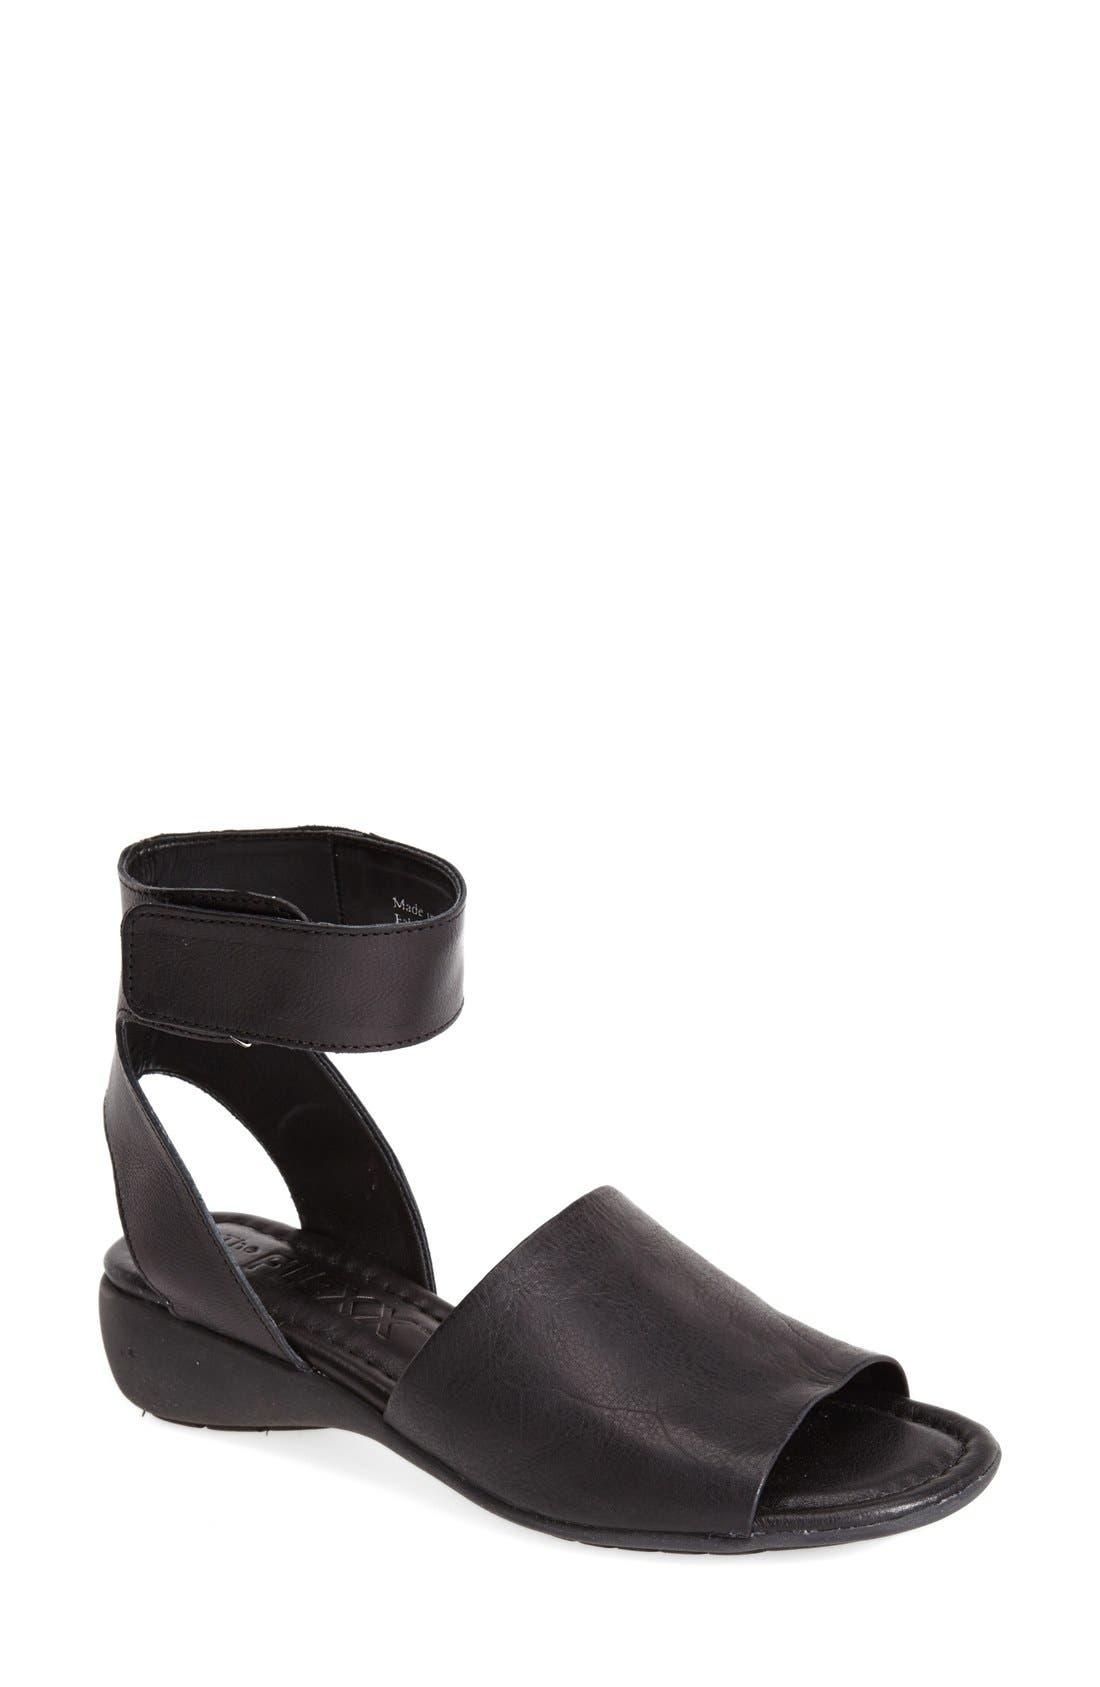 Main Image - The FLEXX 'Beglad' Leather Ankle Strap Sandal